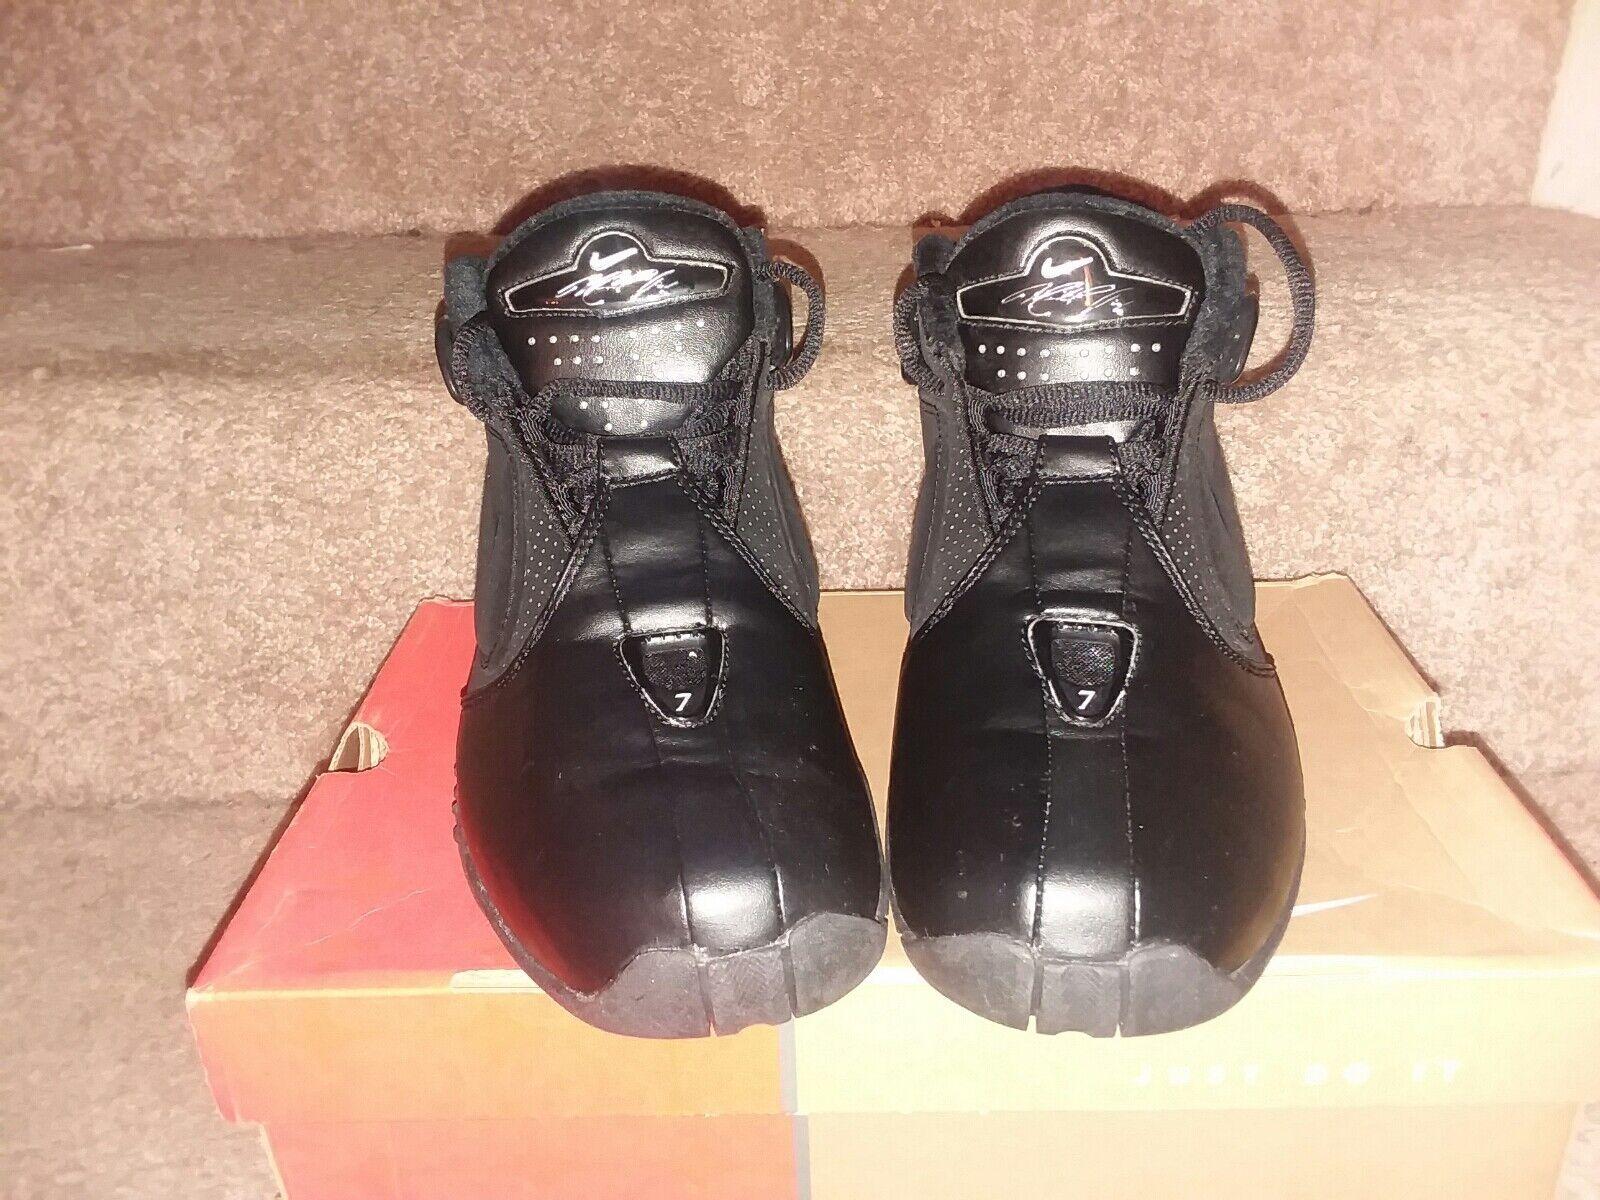 Nike Air Zoom Vick ll OT